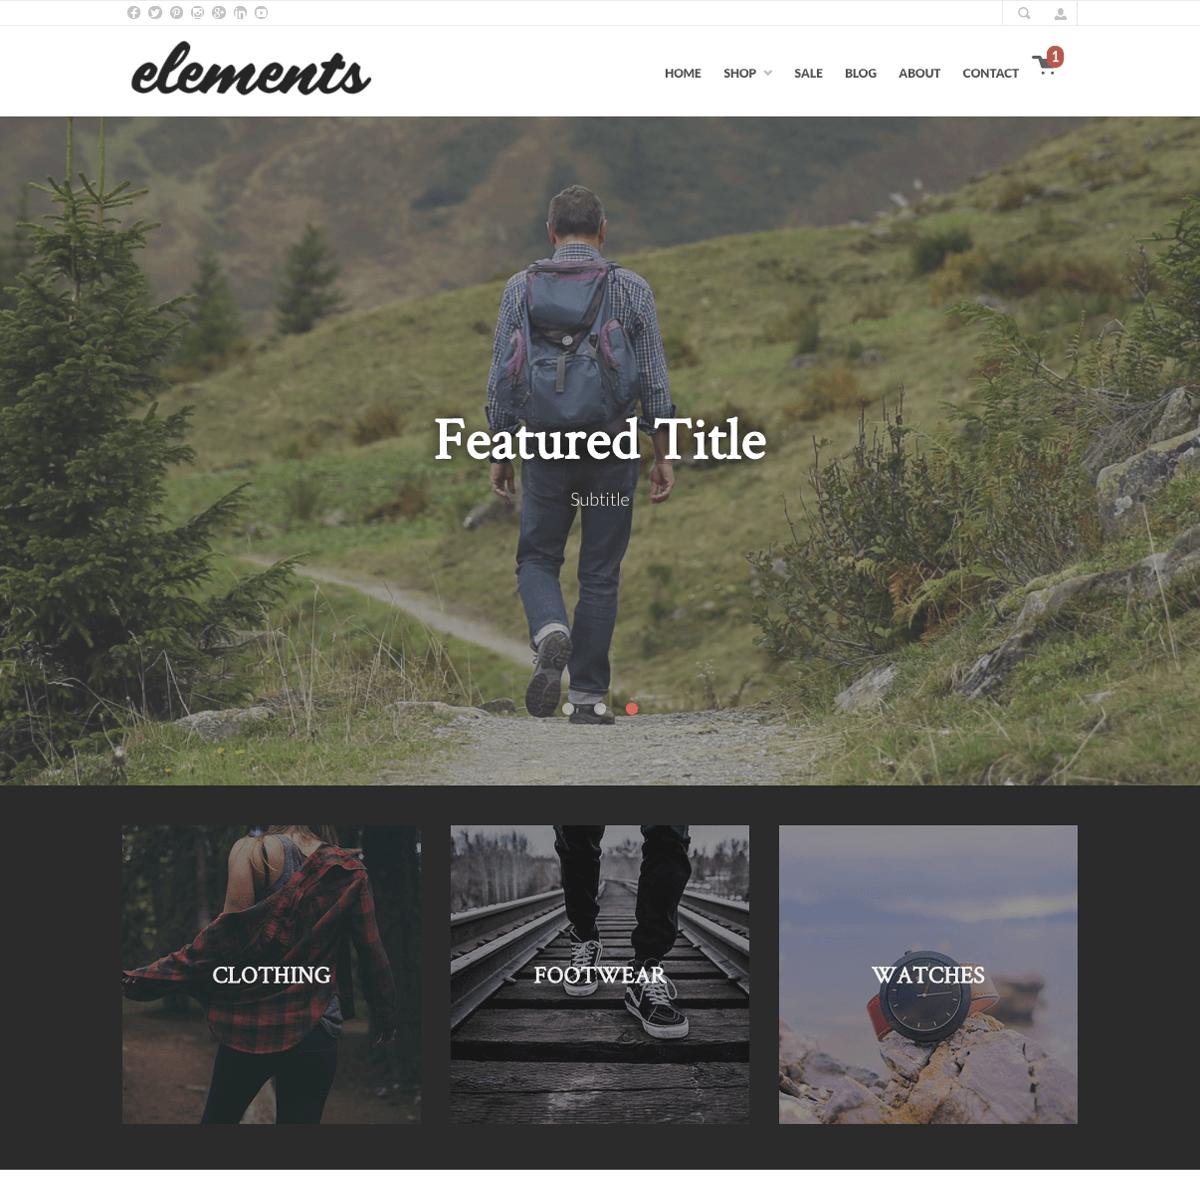 Elements - Desktop